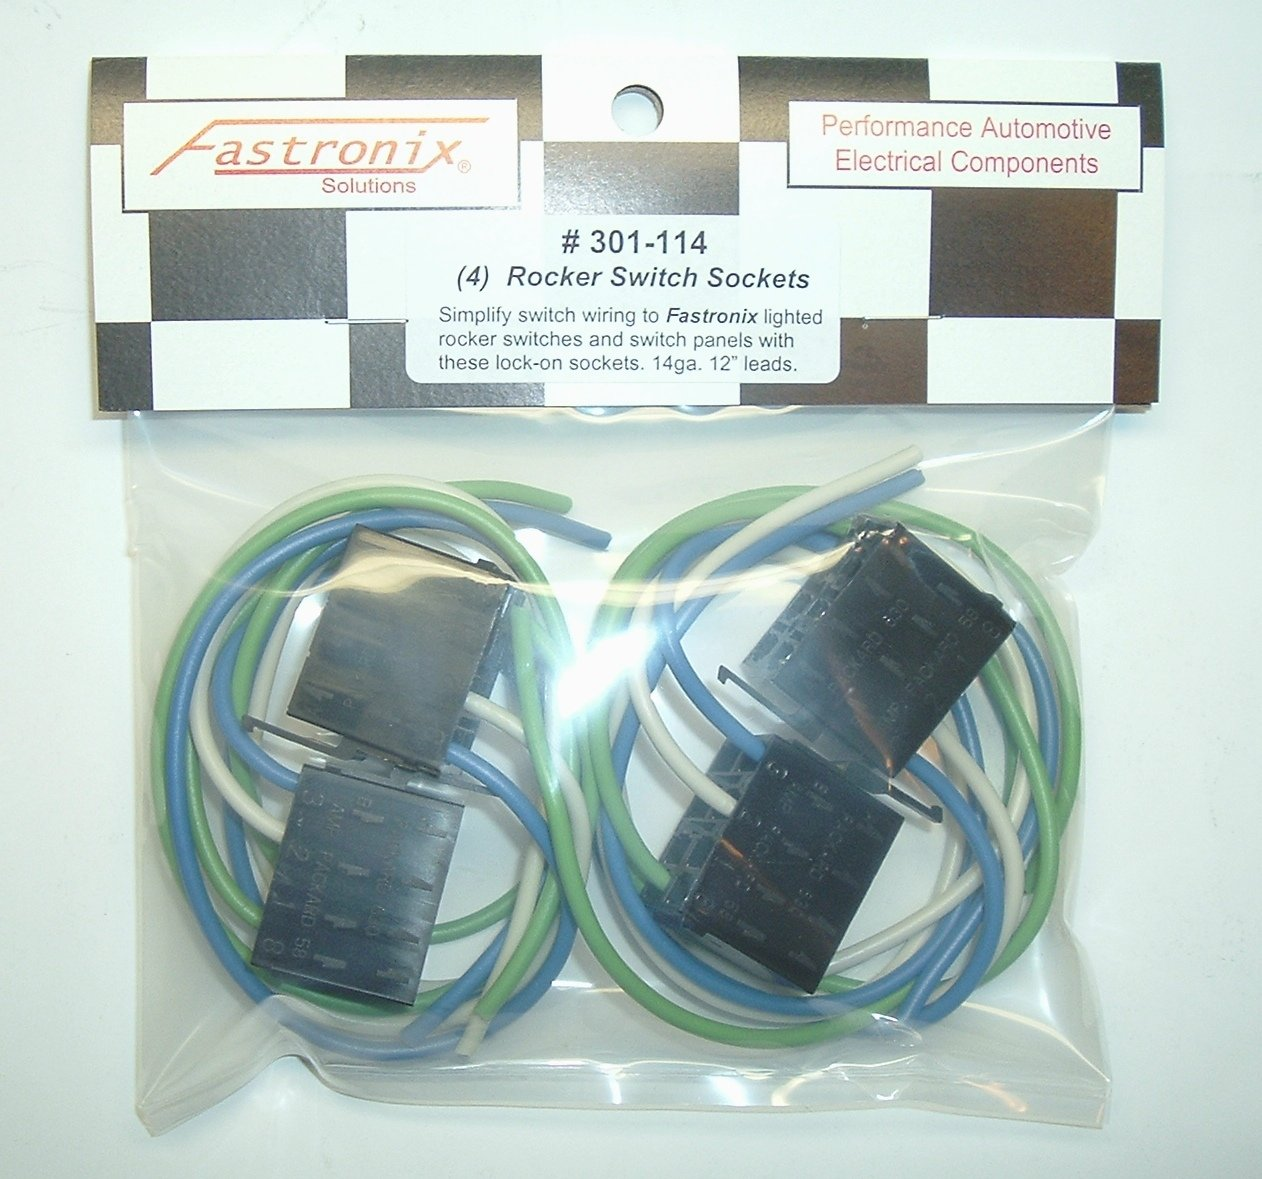 71dQq9XtUHL._SL1262_ amazon com fastronix pre wired rocker switch socket wiring  at bayanpartner.co